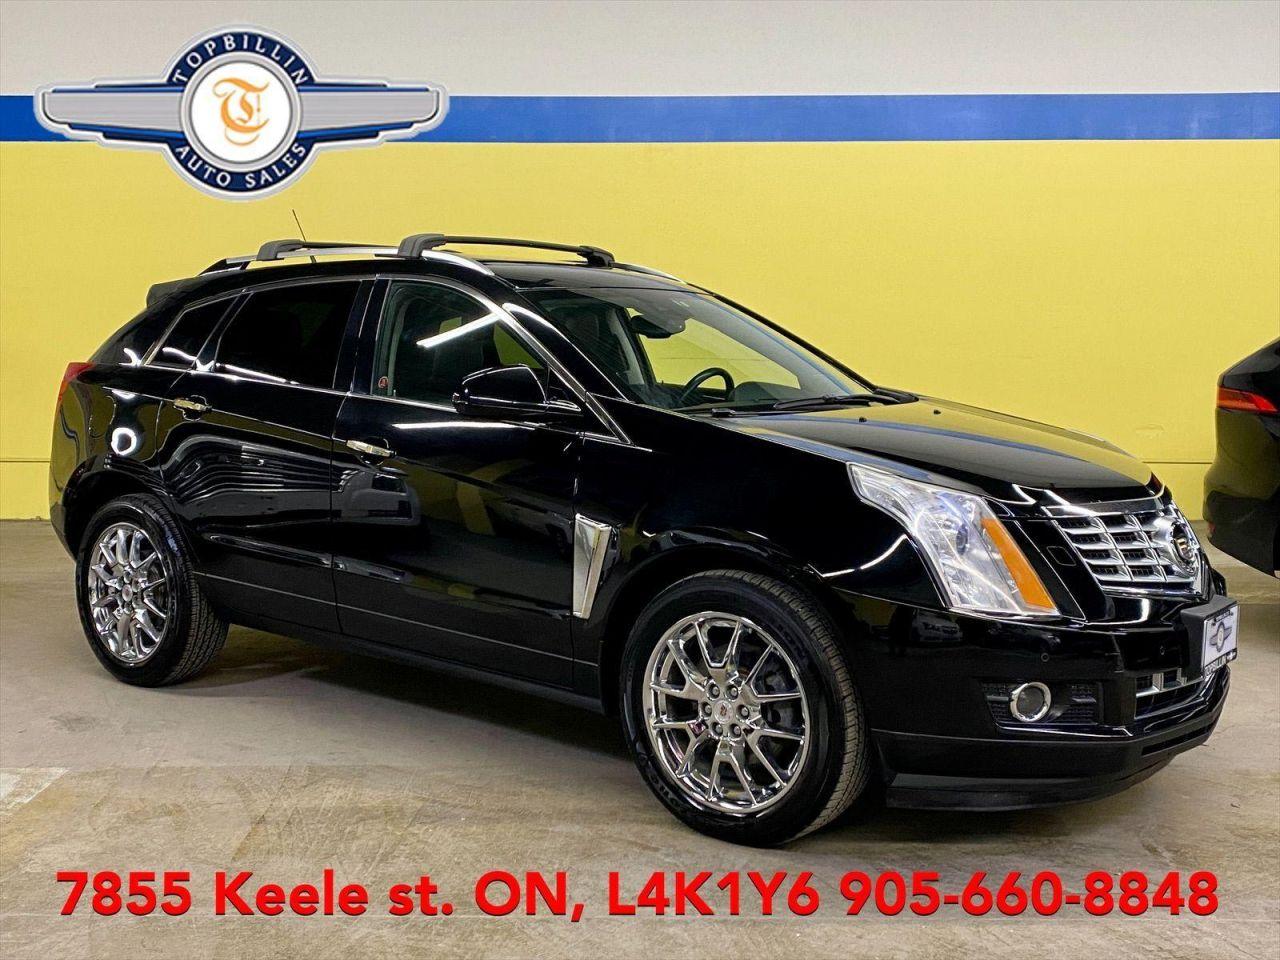 2013 Cadillac SRX Premium AWD, Navi, Pano Roof, Keep Lane